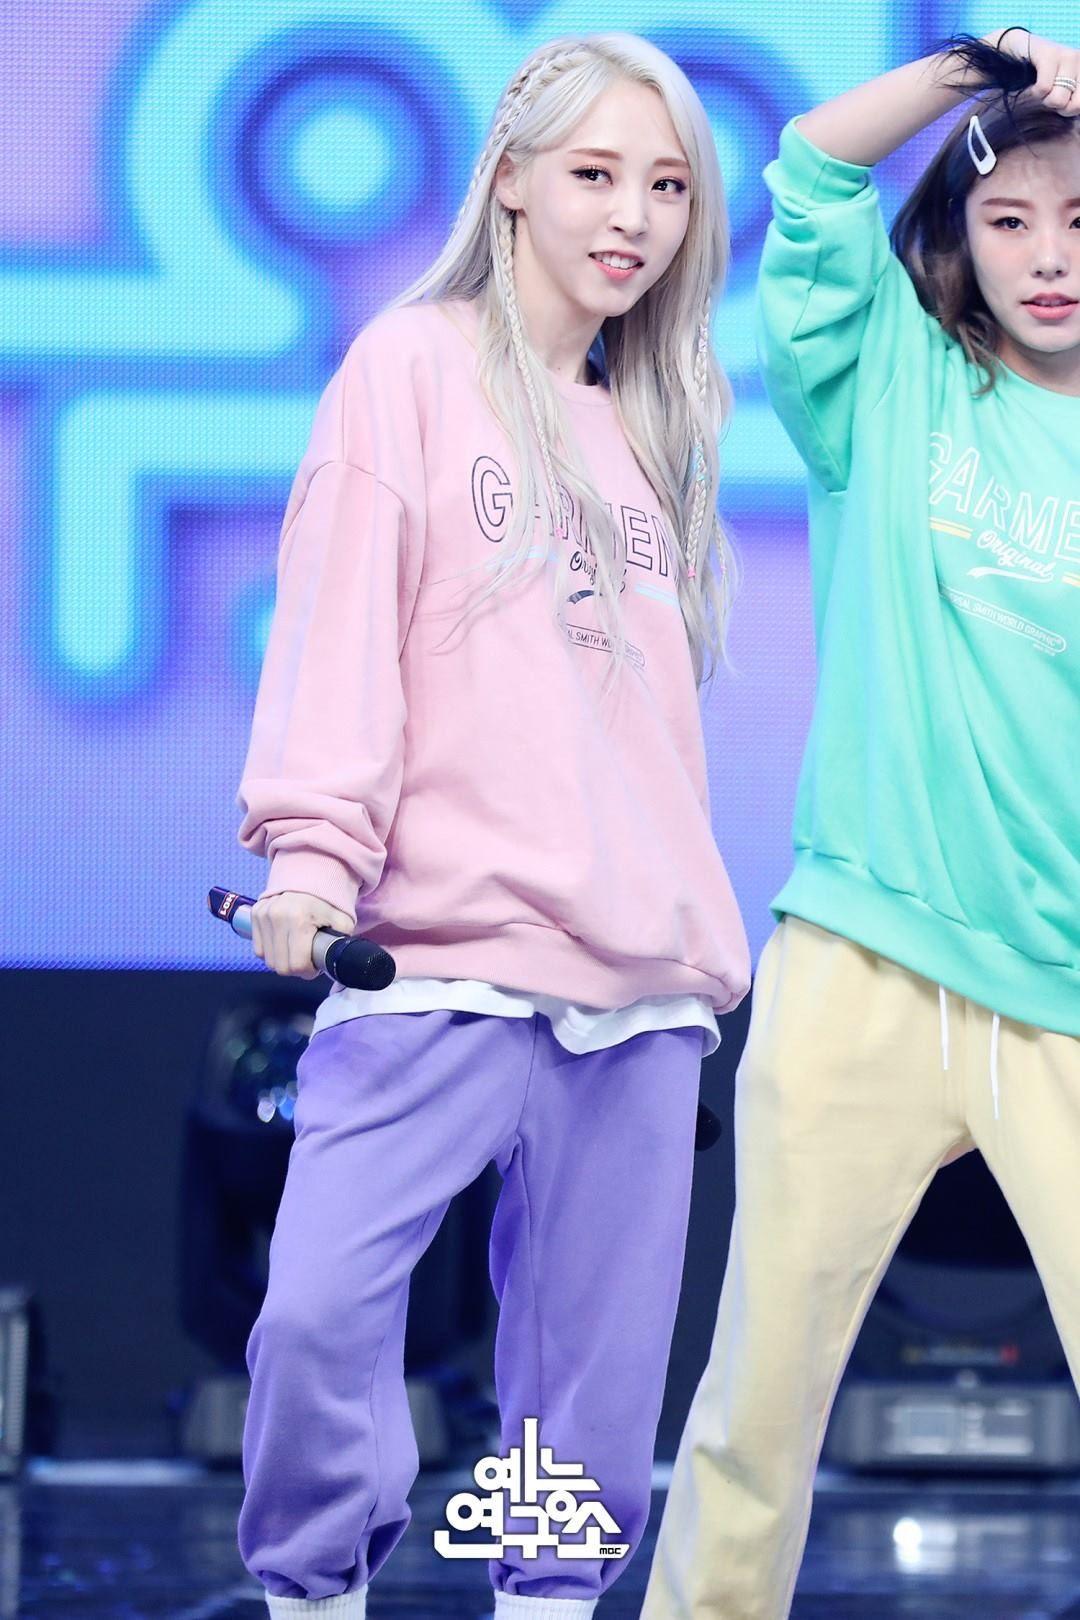 Weareoneidols Mamamoo Moonbyul Kpop Girlgroup Idol Bias Rapper Music Mamamoo Mamamoo Moonbyul Moonbyul